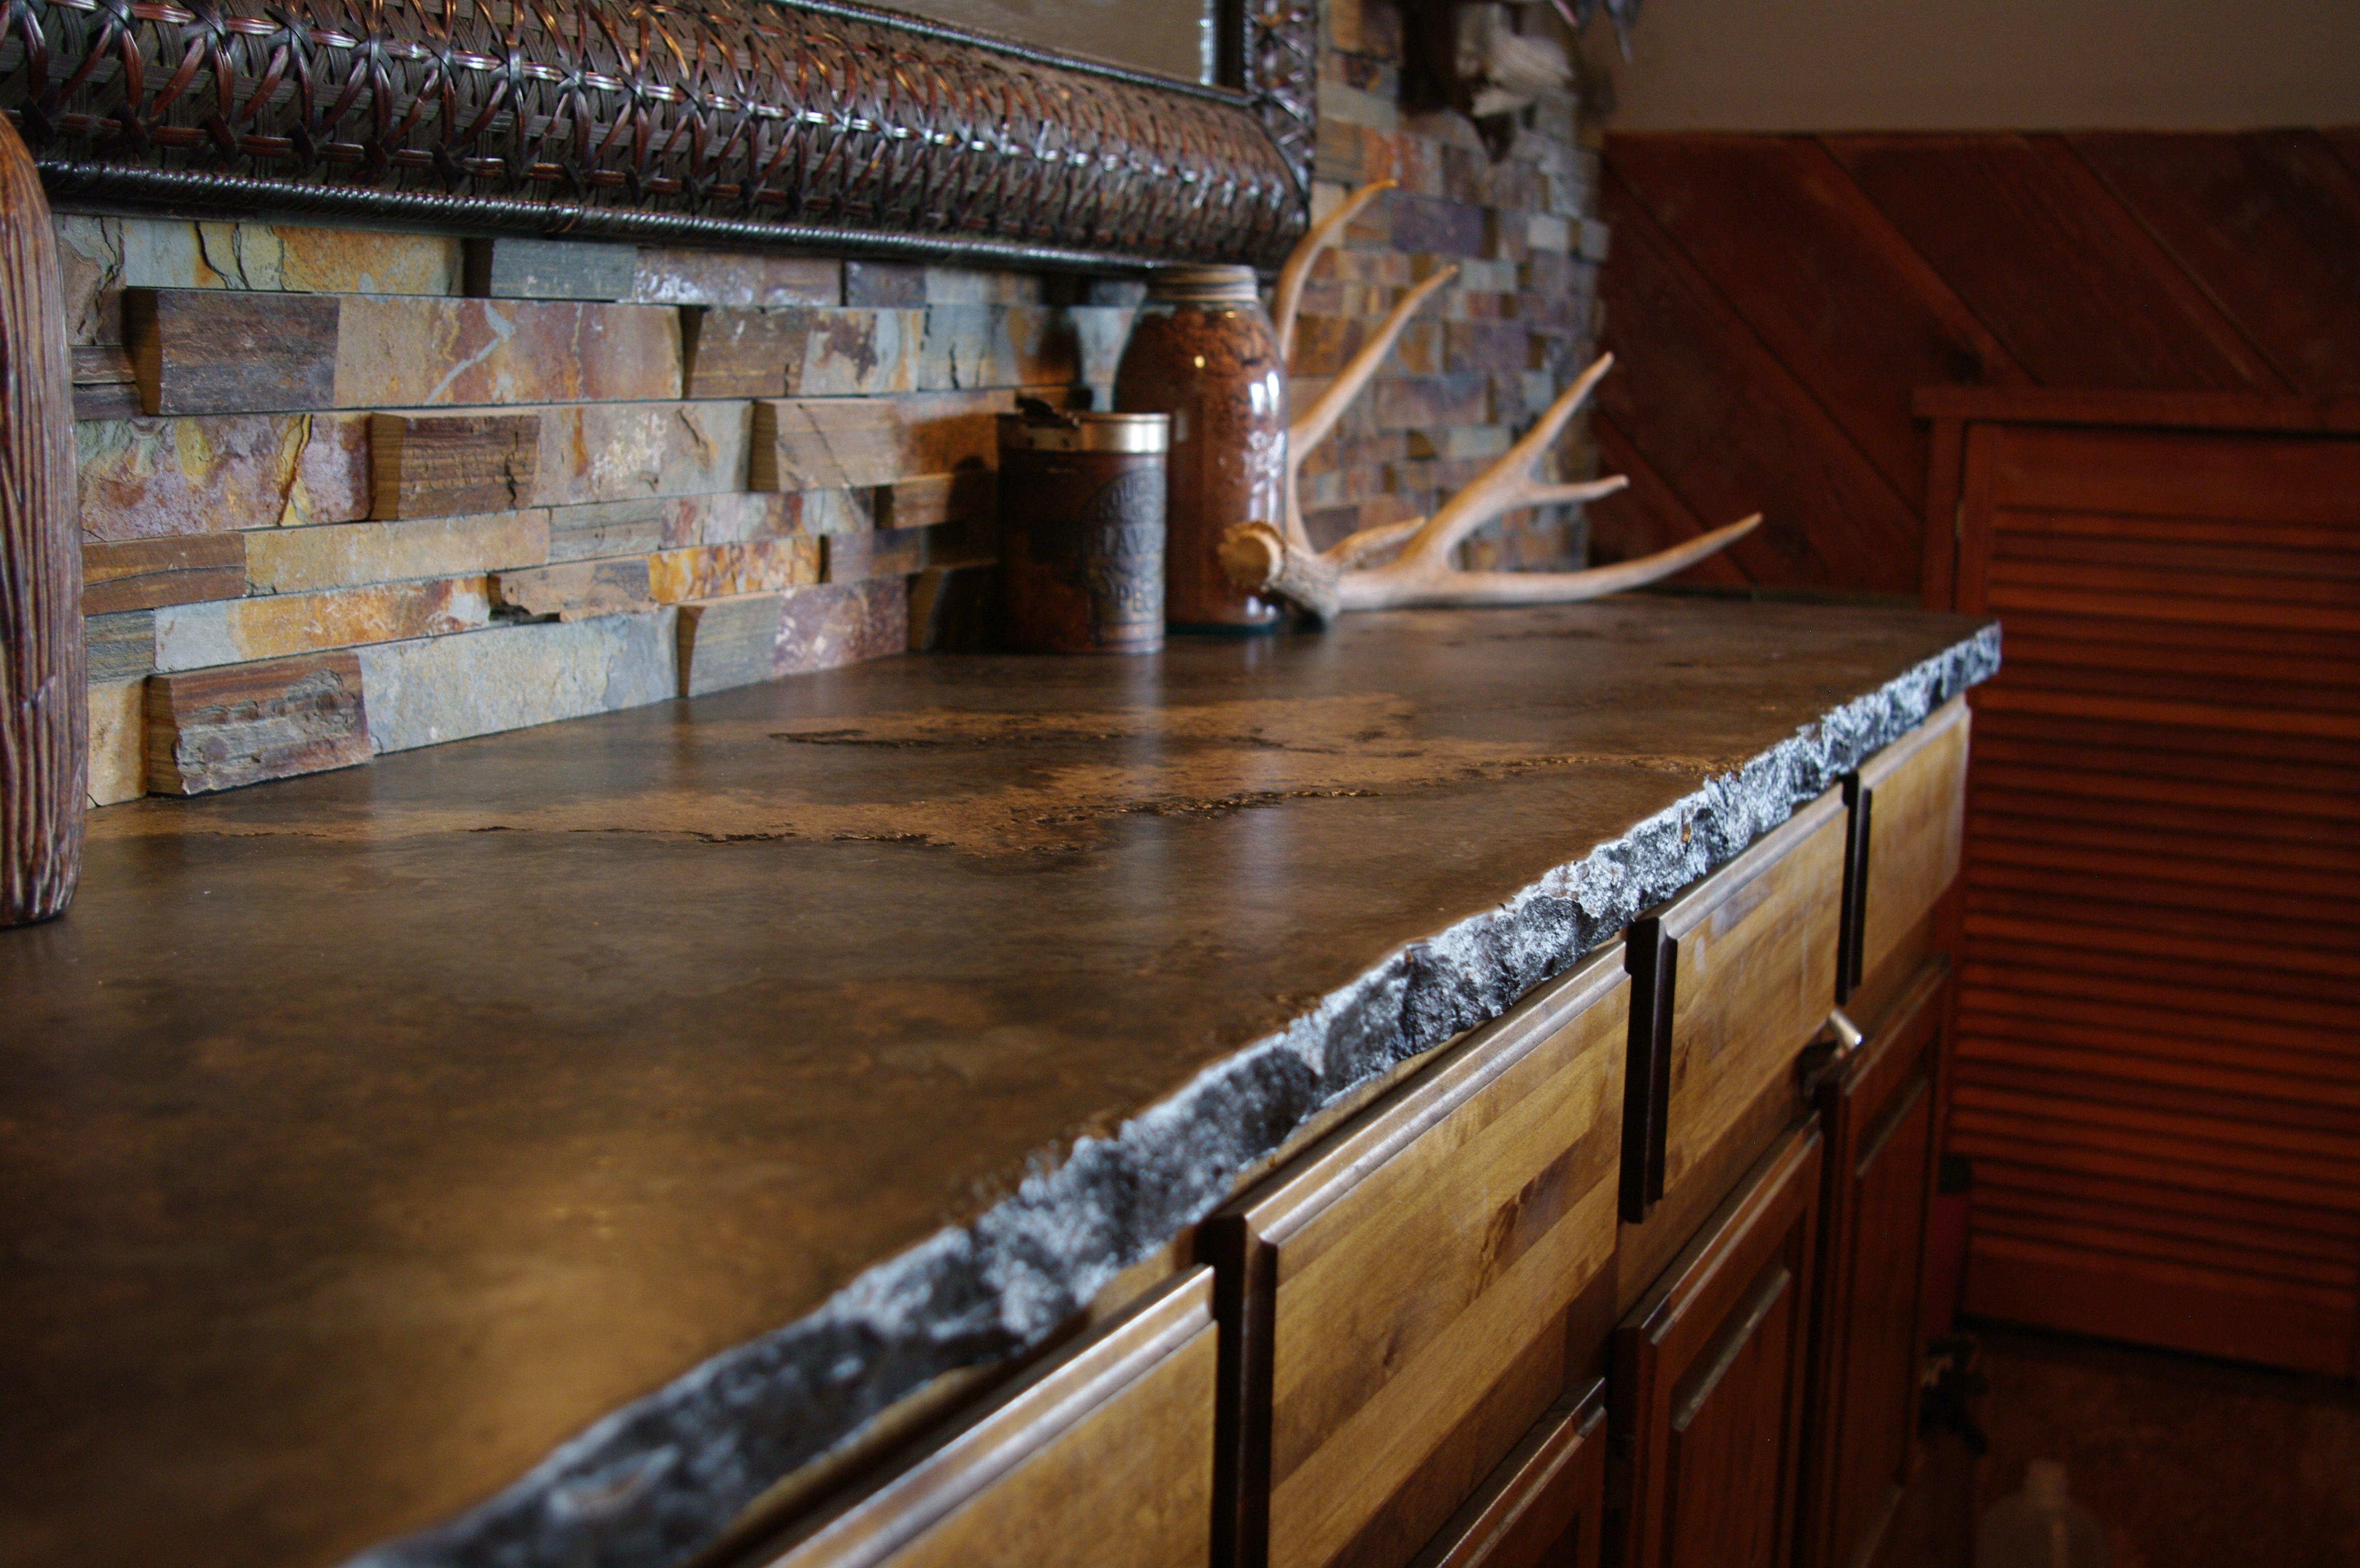 Dark Rustic Cabin Countertop With Broken Flagstone Or Rock Edge Rustic Countertops Outdoor Kitchen Design Outdoor Kitchen Countertops